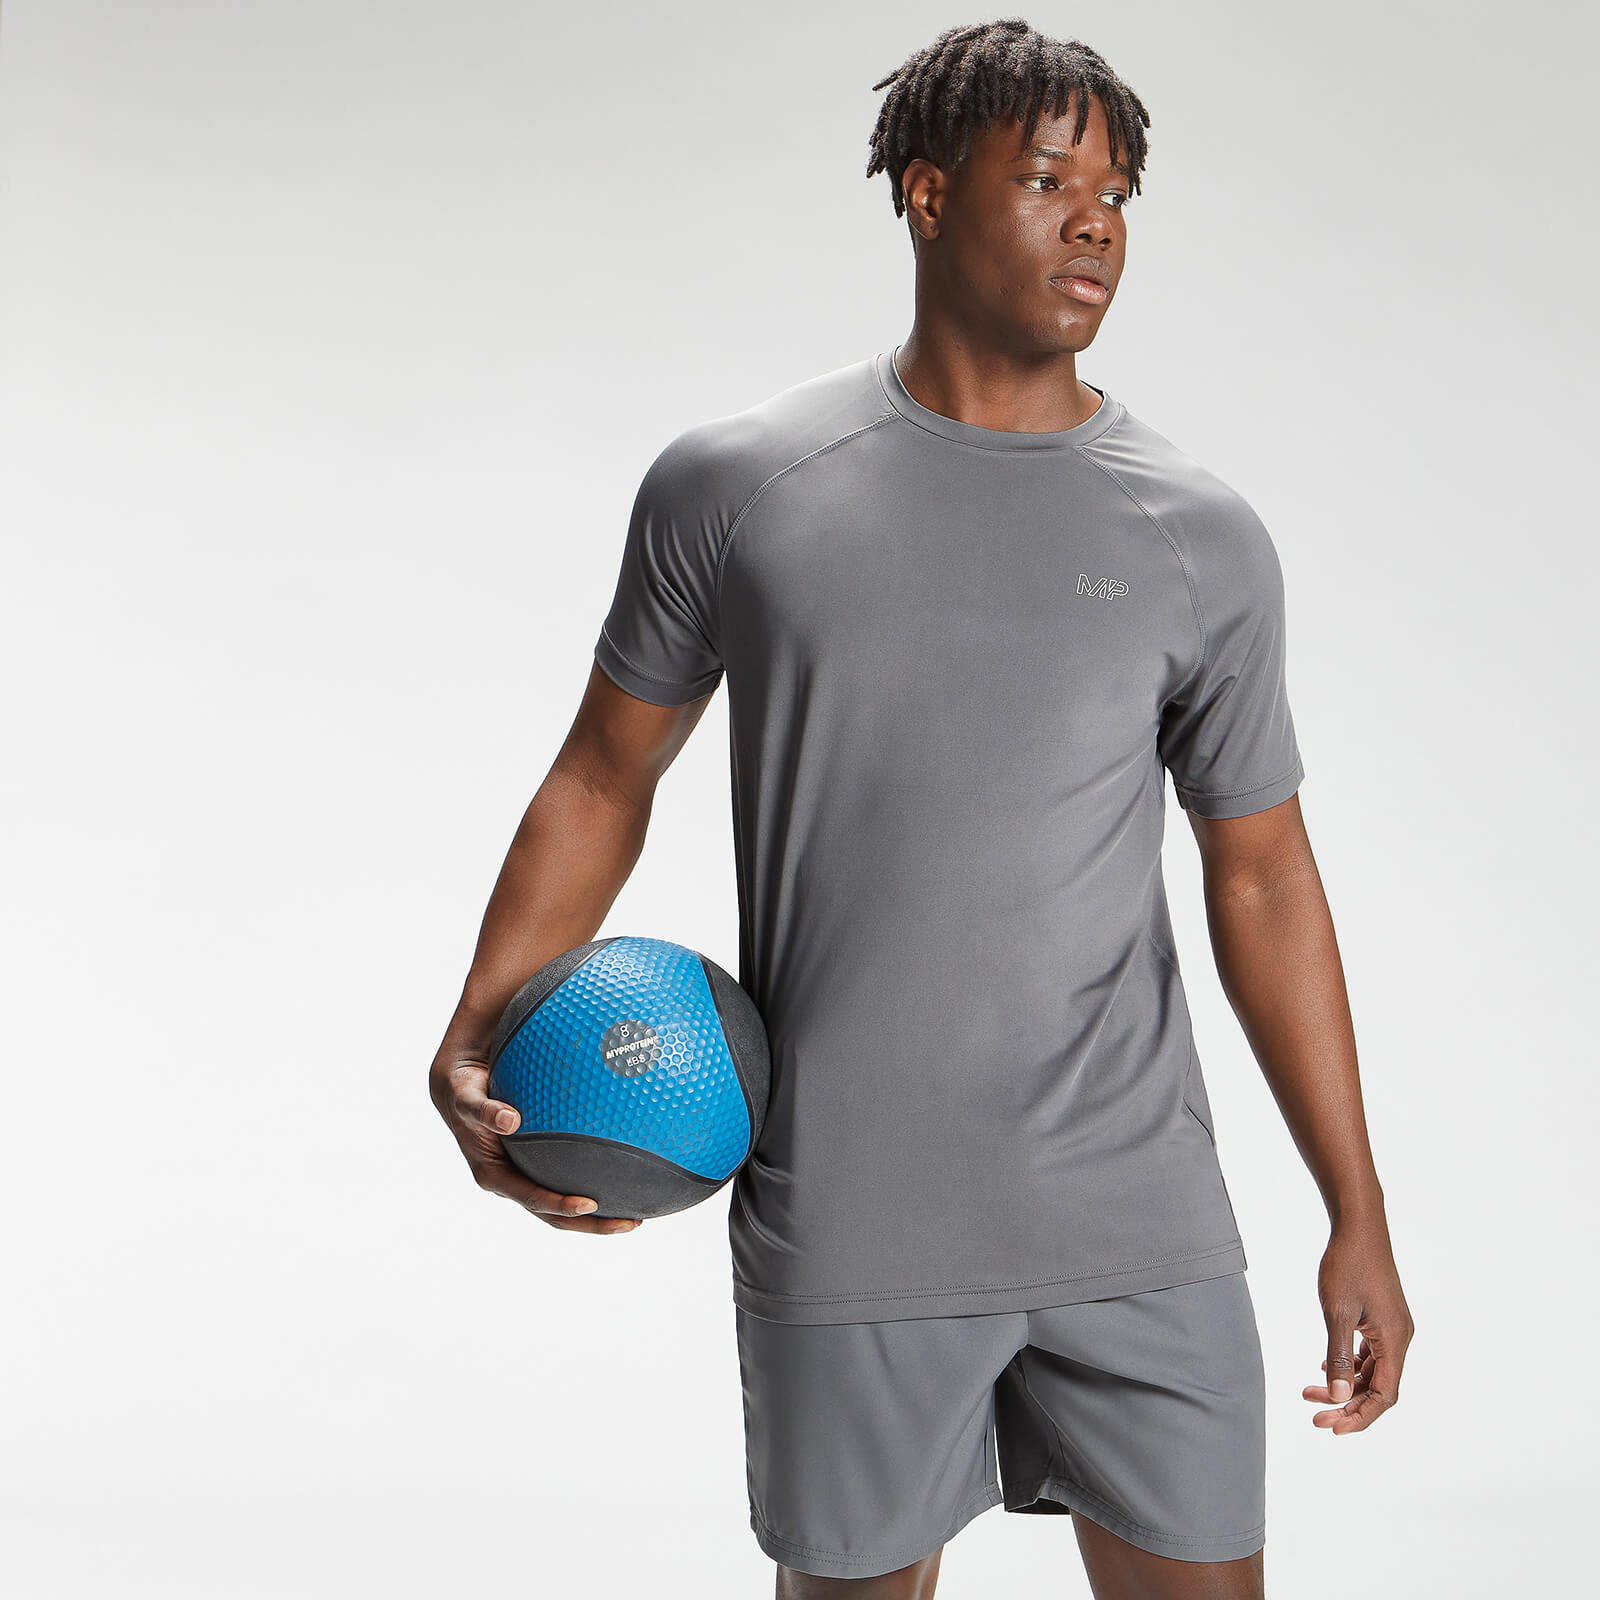 Купить MP Men's Repeat Mark Graphic Training Short Sleeve T-Shirt - Carbon - XXXL, Myprotein International